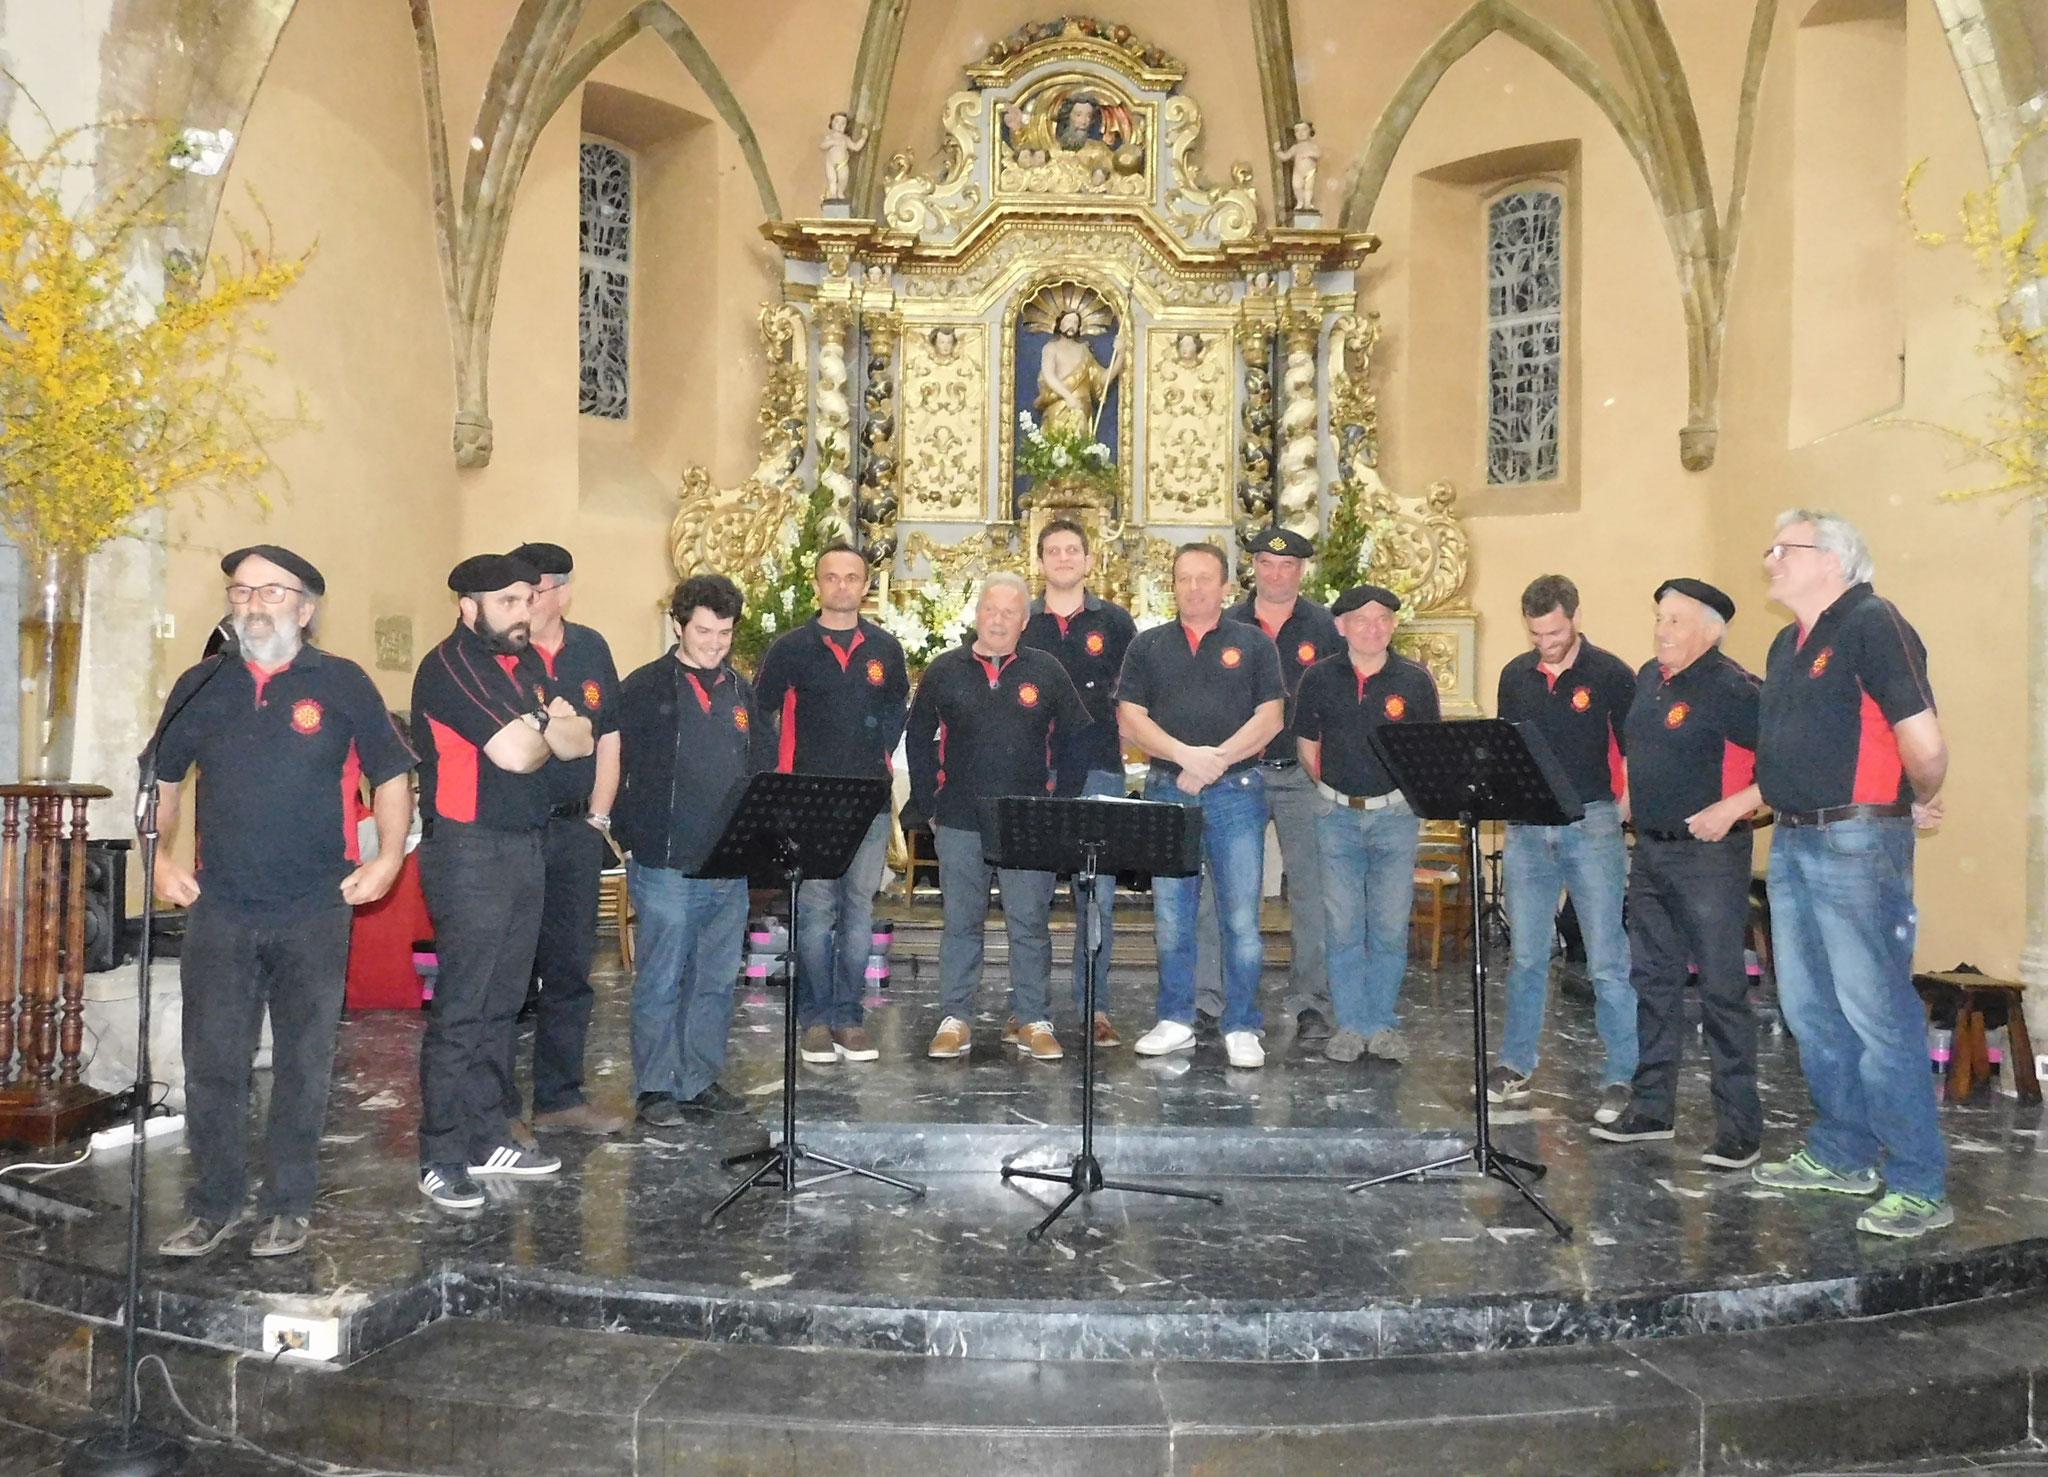 Et la chorale Adishatz du Magnoac